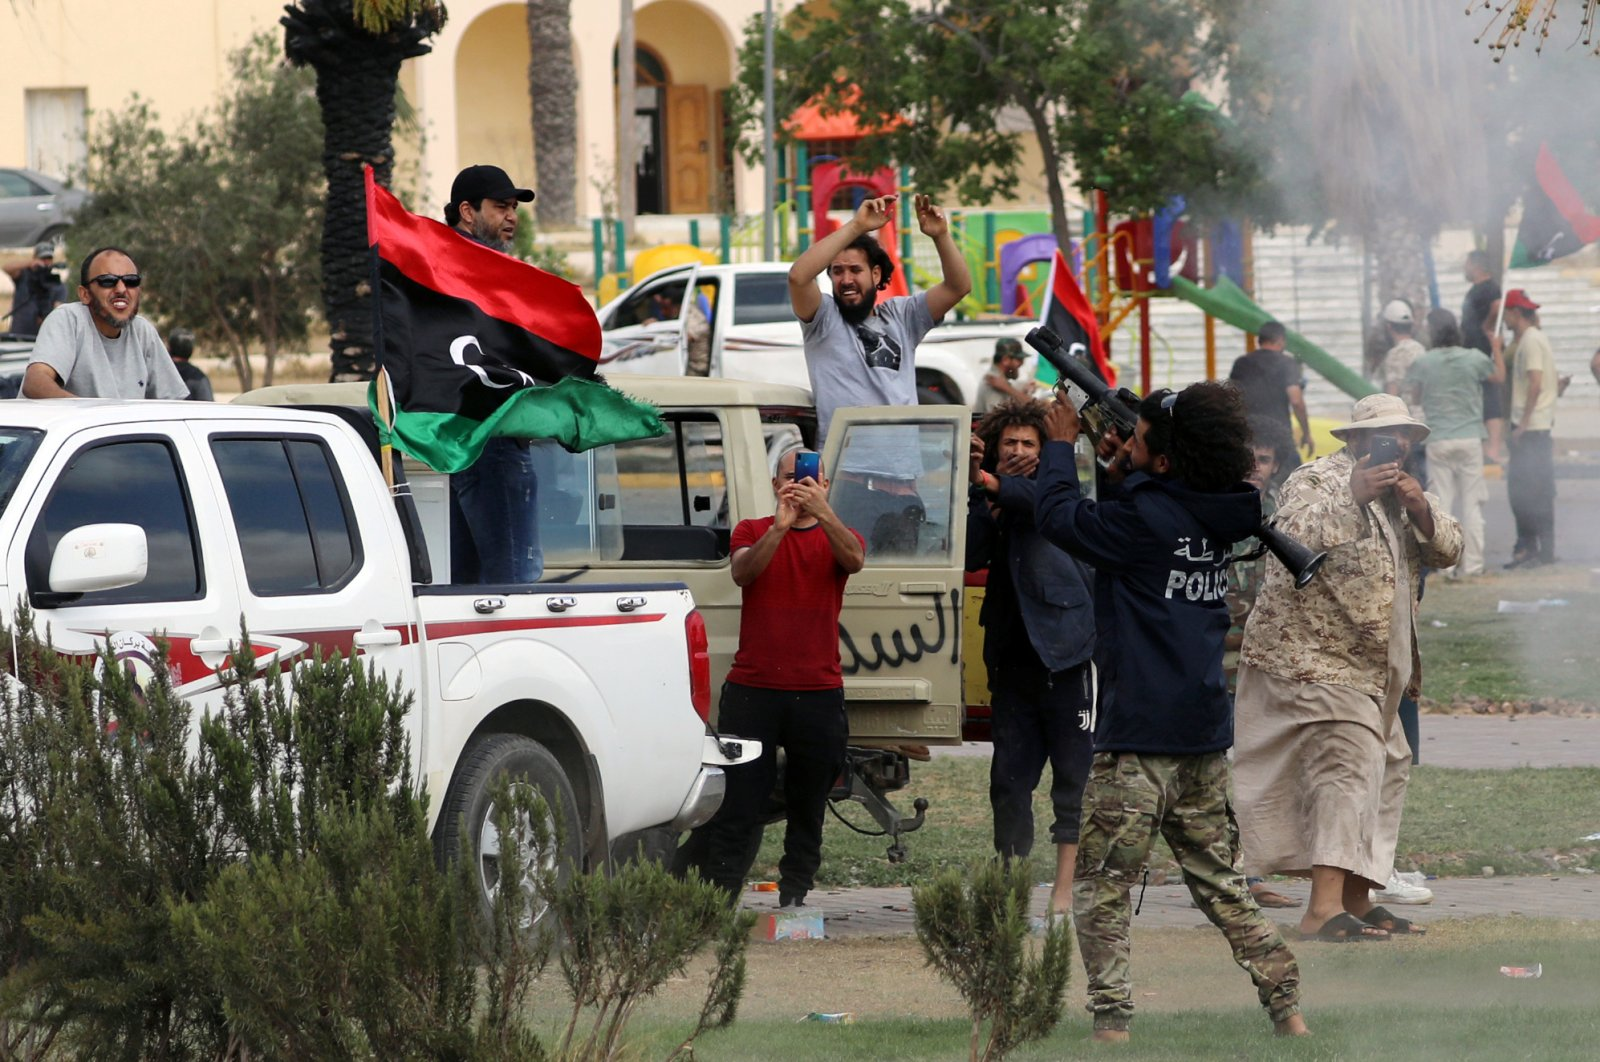 Fighters loyal to Libya's internationally recognized government celebrate after regaining control of Tarhuna city, Libya, June 5, 2020. (REUTERS Photo)